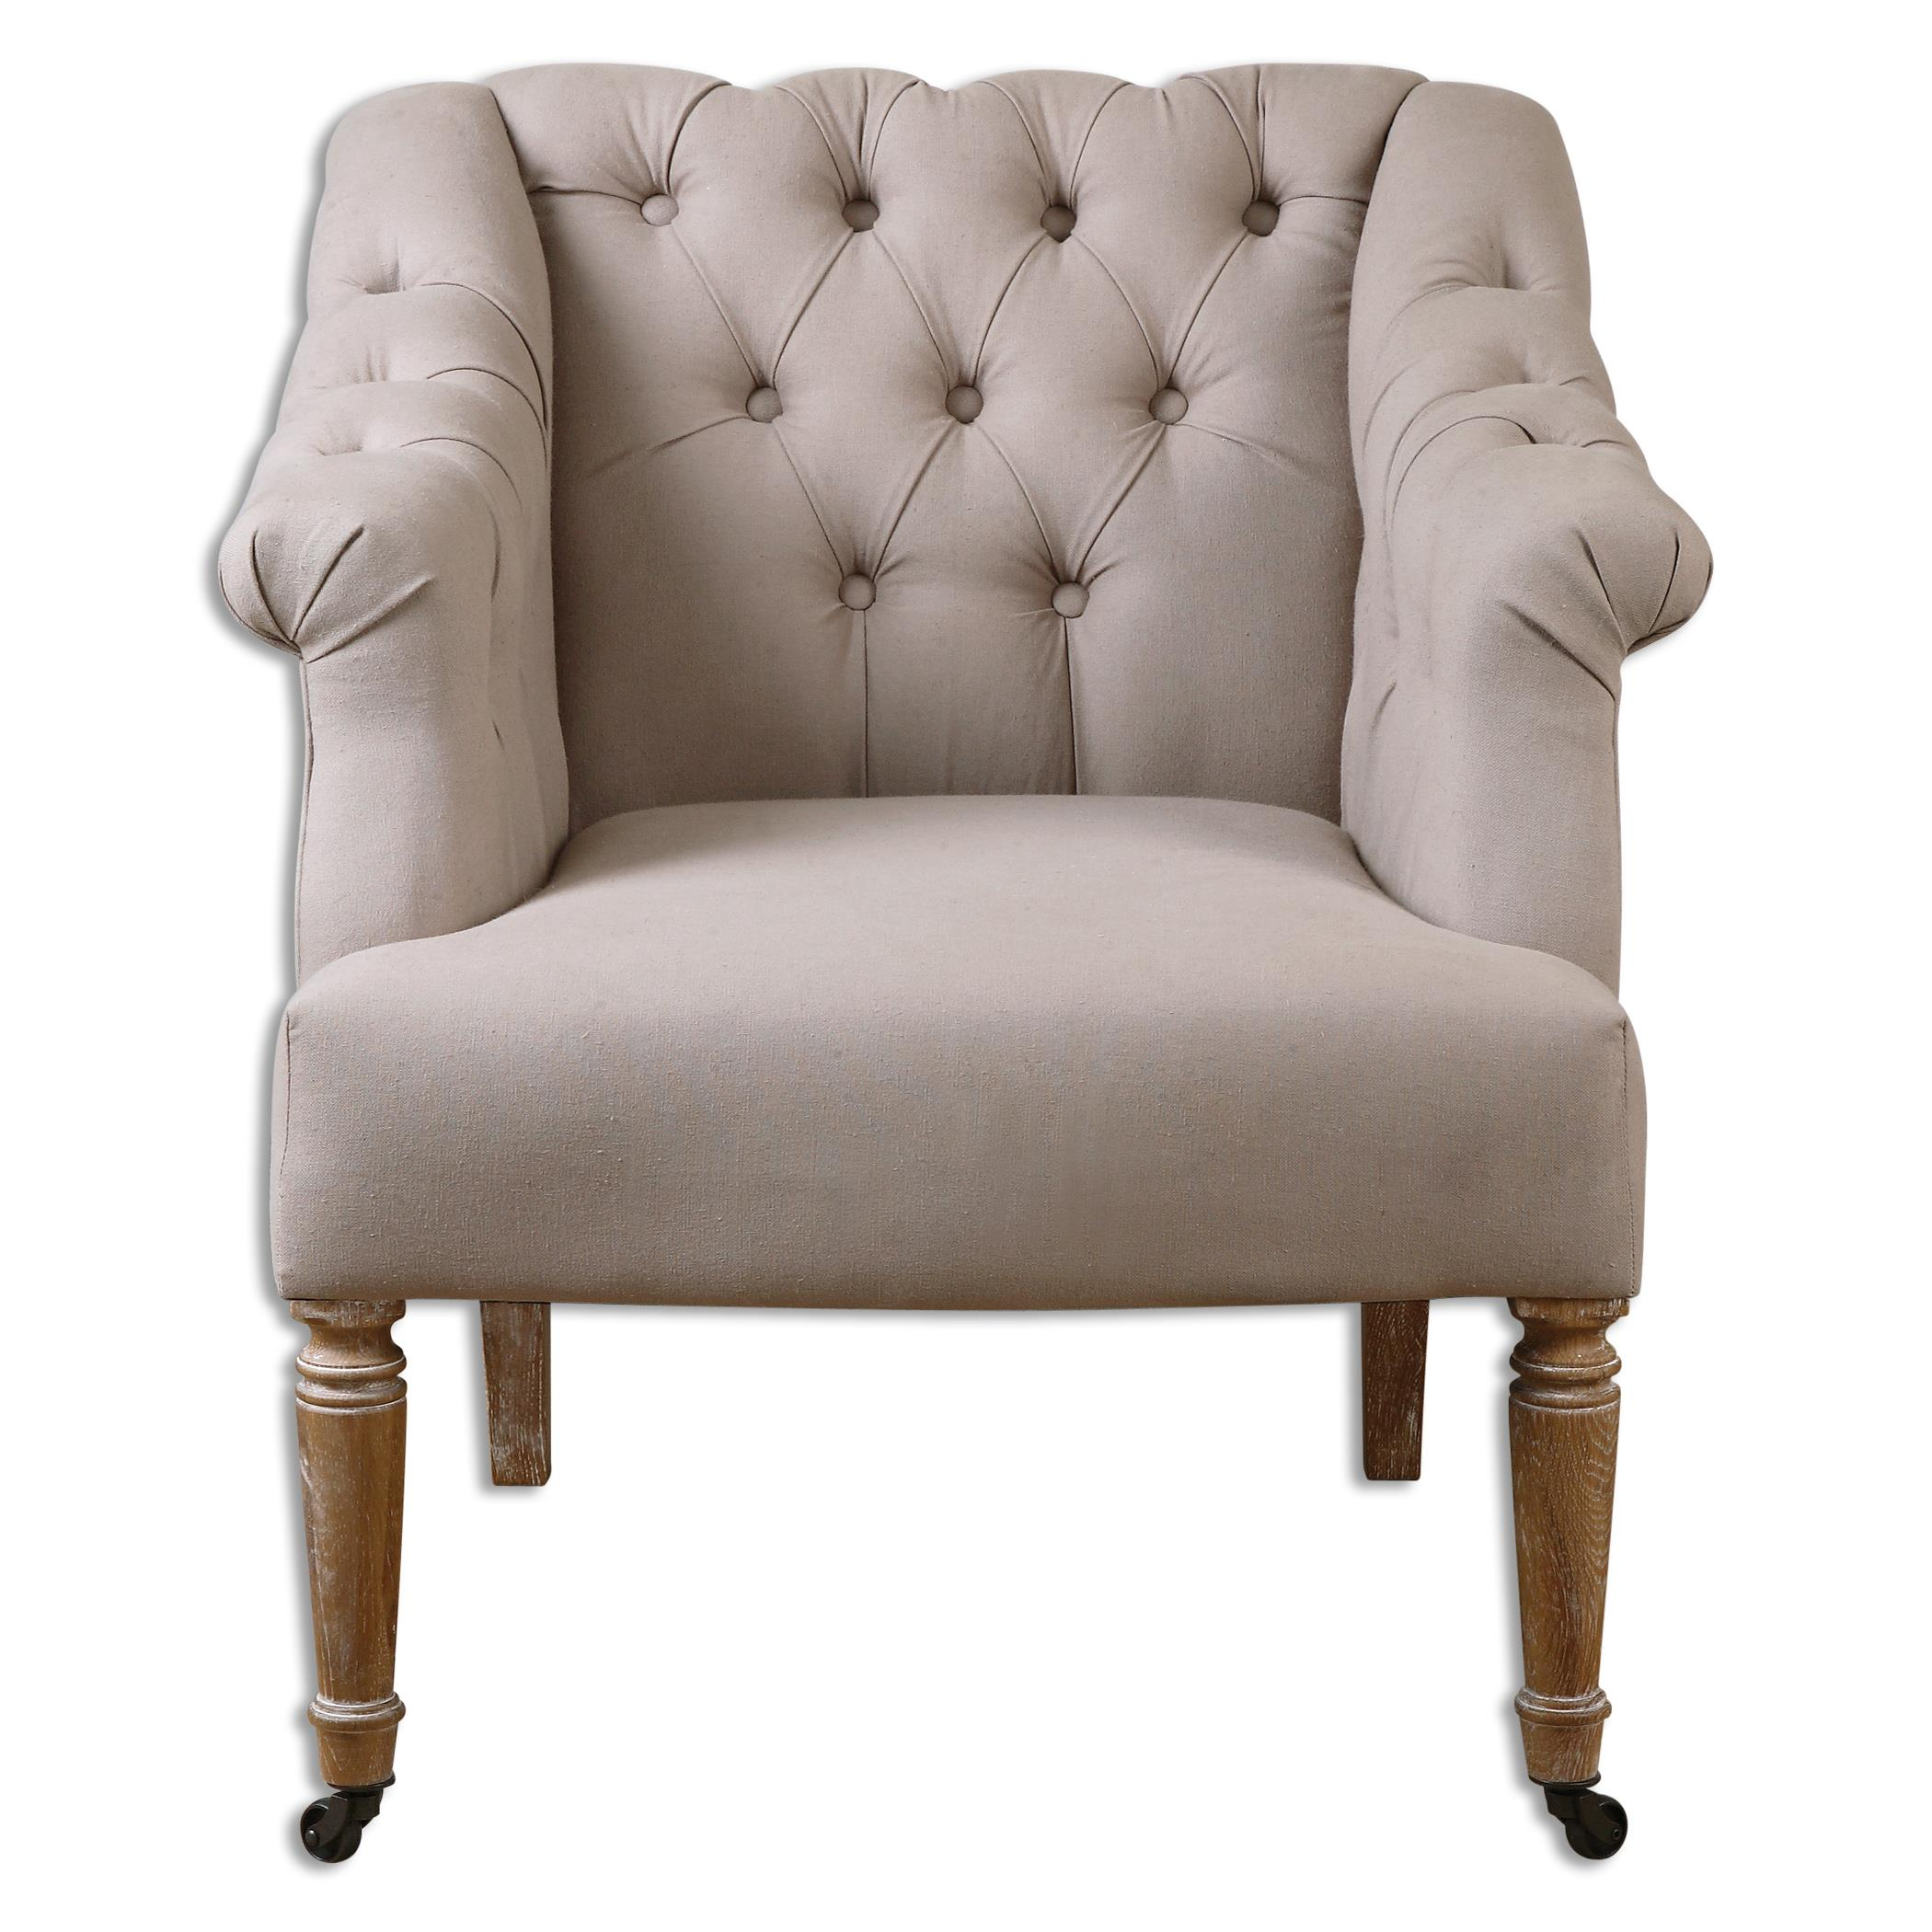 Uttermost Accent Furniture Khaldun Tufted Armchair - Item Number: 23194